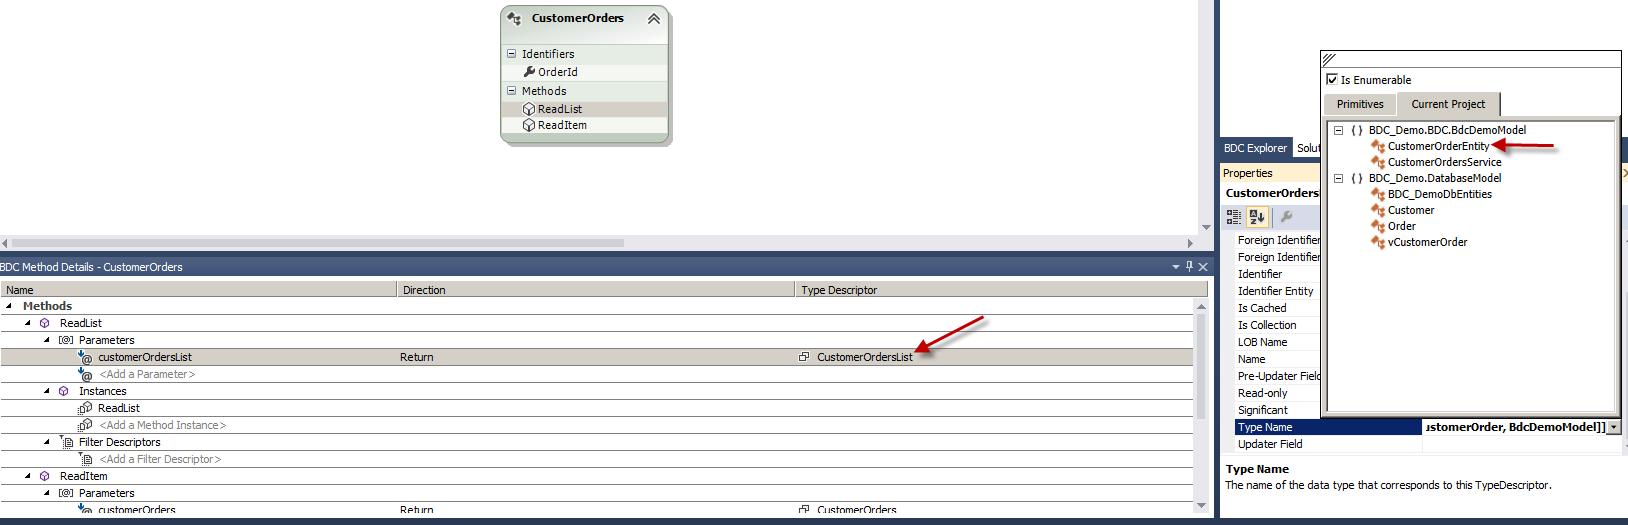 Set Type Name for ReadList Return Parameter